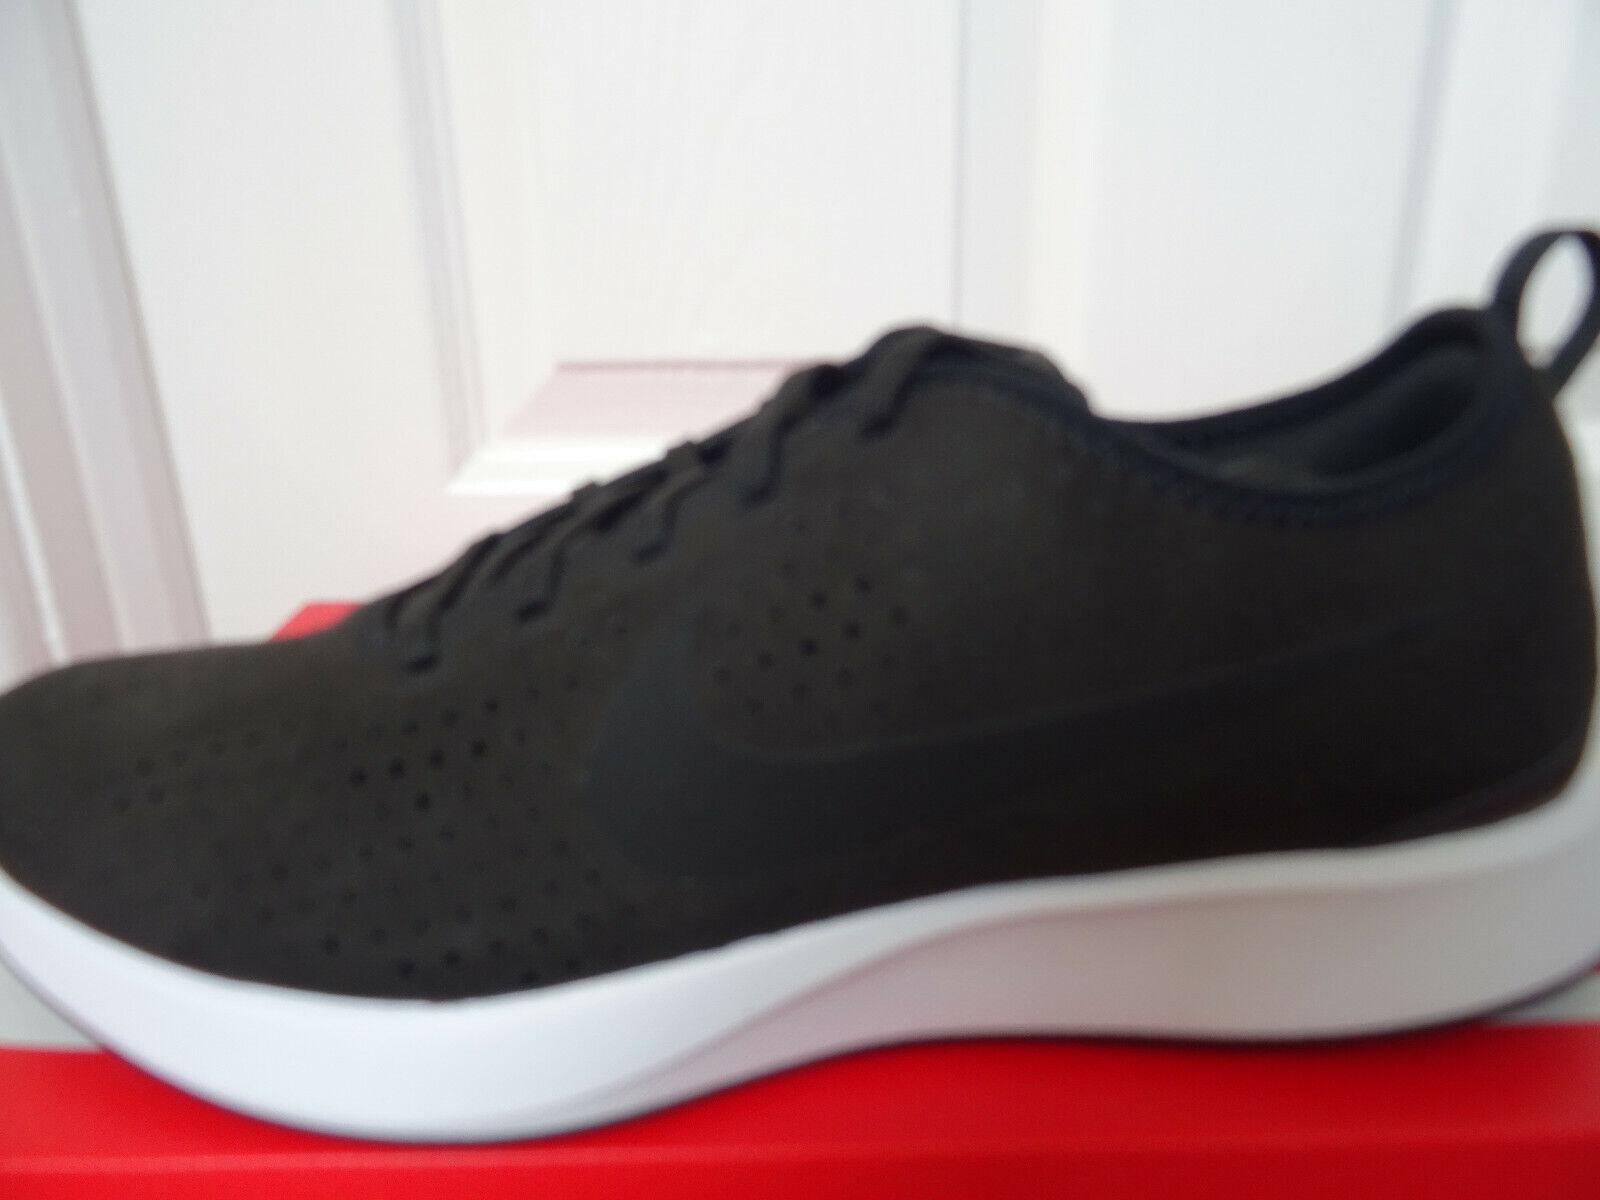 Nike Dualtone Racer PRM schuhe trainers 924448 002 uk 9.5 eu 44.5 us 10.5 NEW+BOX